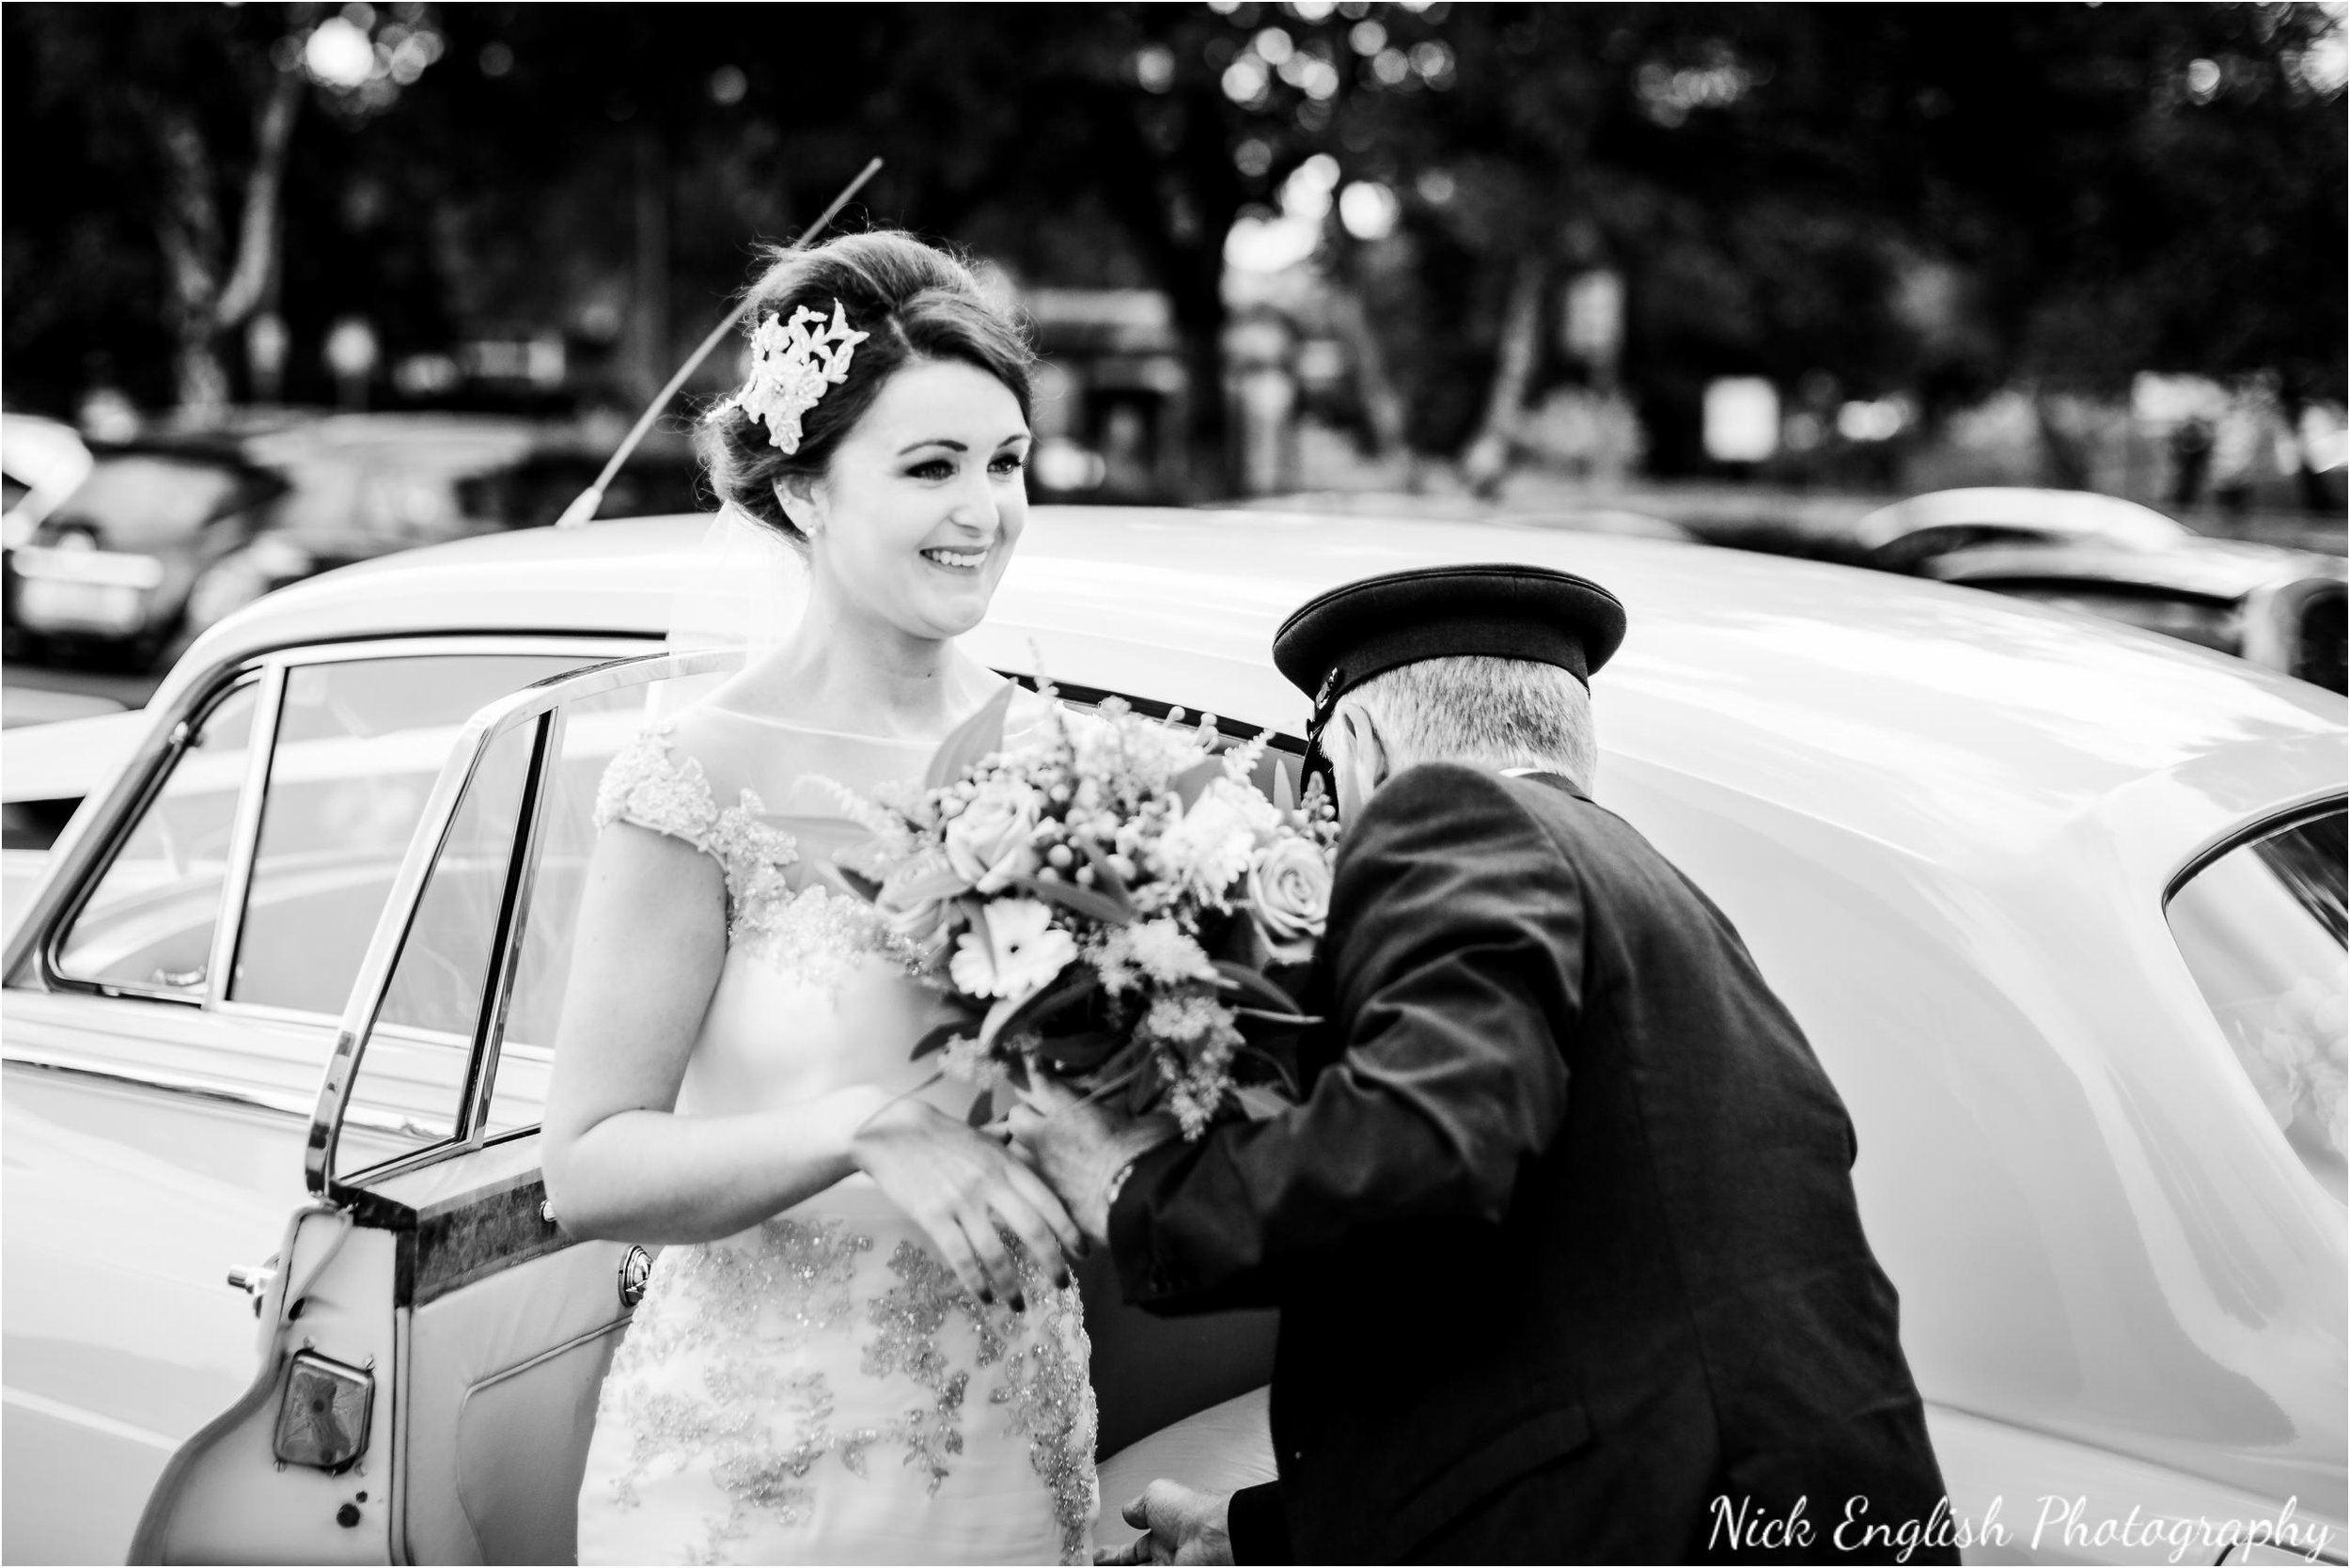 Stacey-Ash-Wedding-Photographs-Stanley-House-Preston-Lancashire-40.jpg